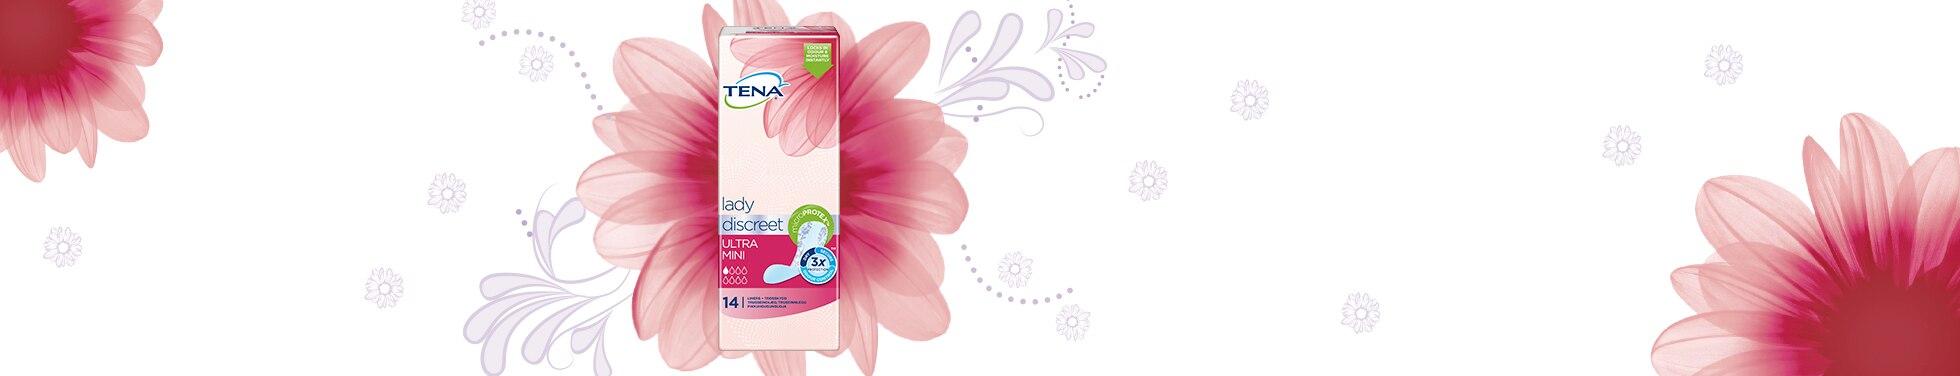 Produktbilde av TENA Lady Discreet Ultra Mini